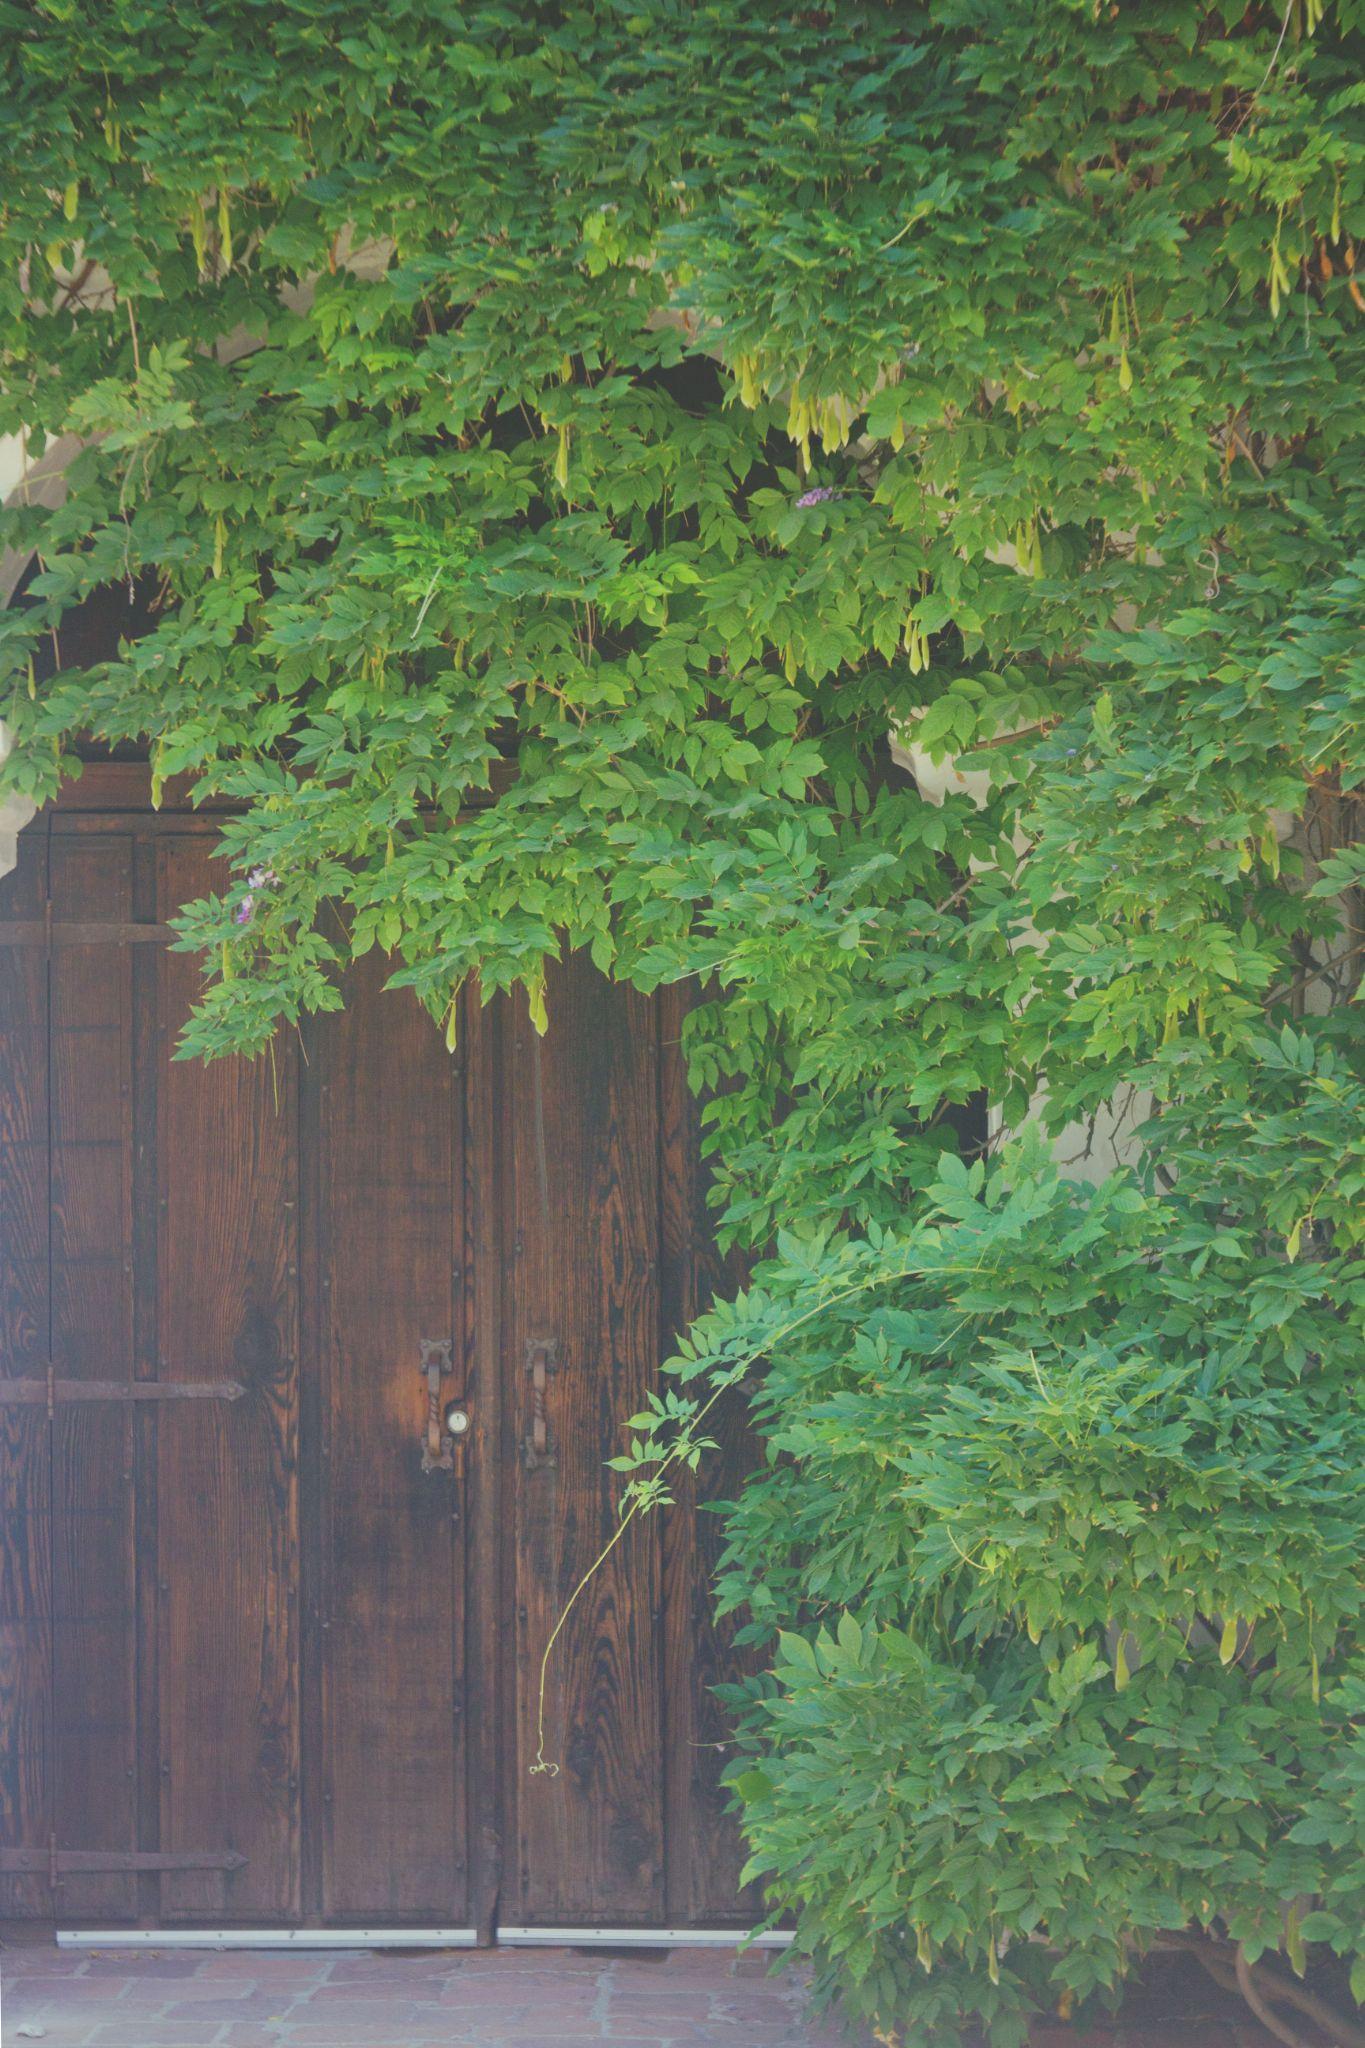 Door at Mission San Luis Rey by amanda.m.wyatt.3